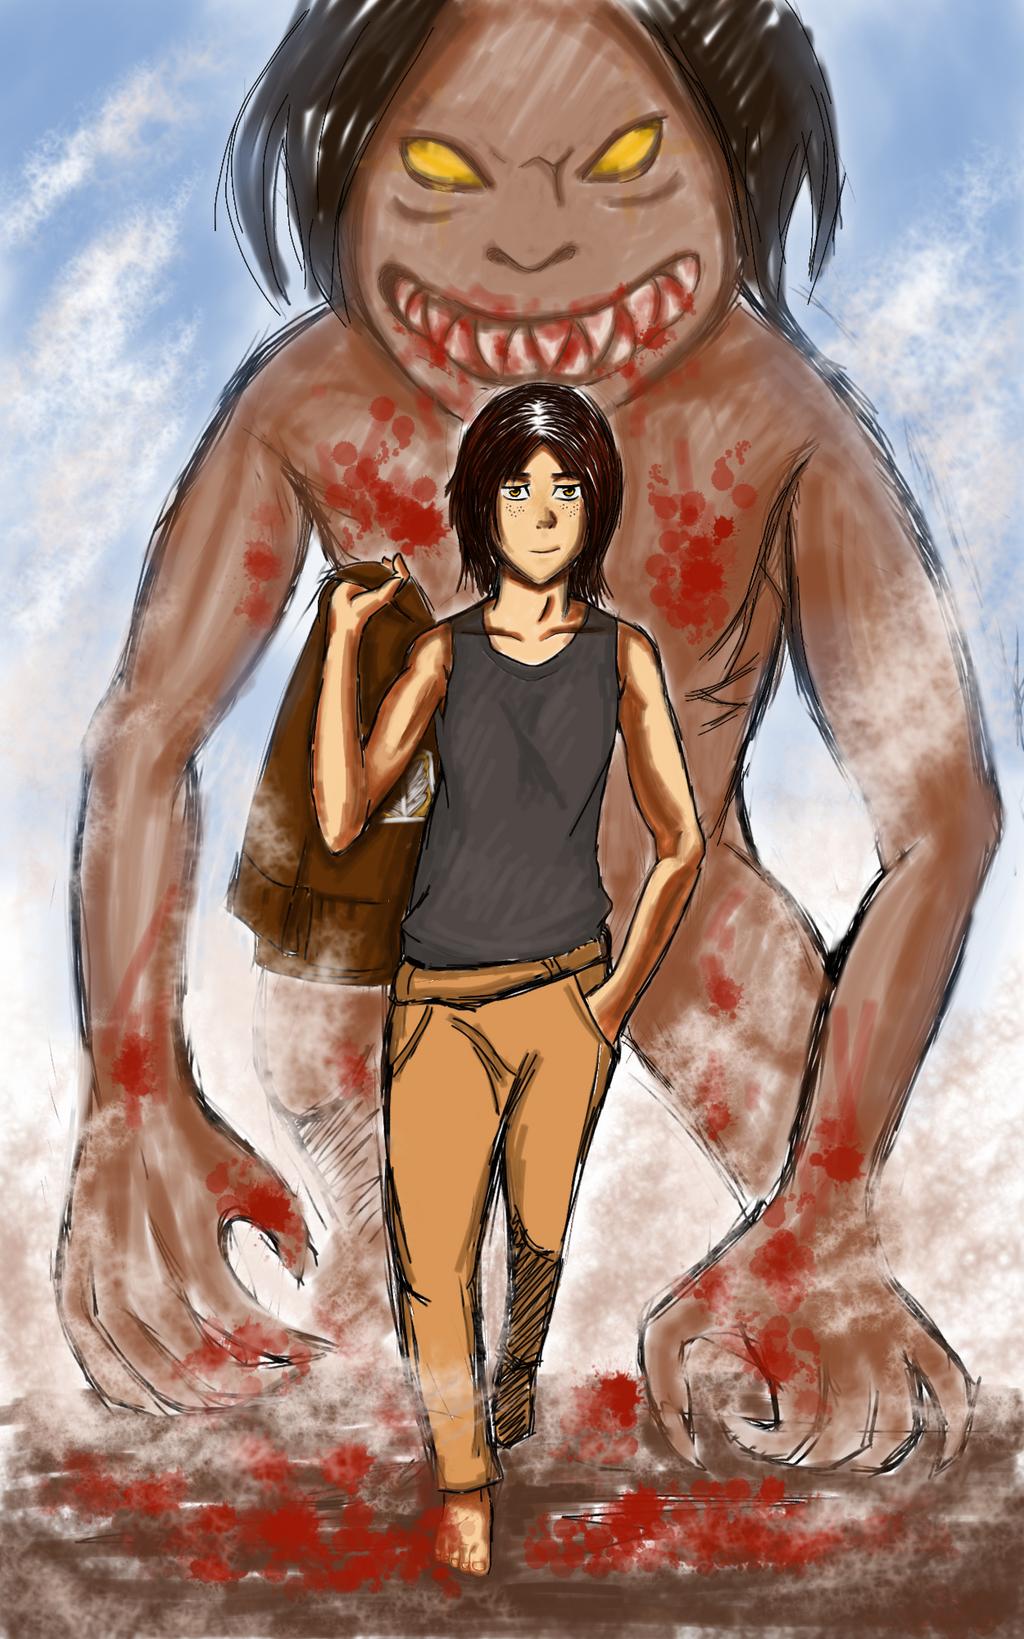 Ymir in Human and Titan form by LianTagataro on DeviantArt